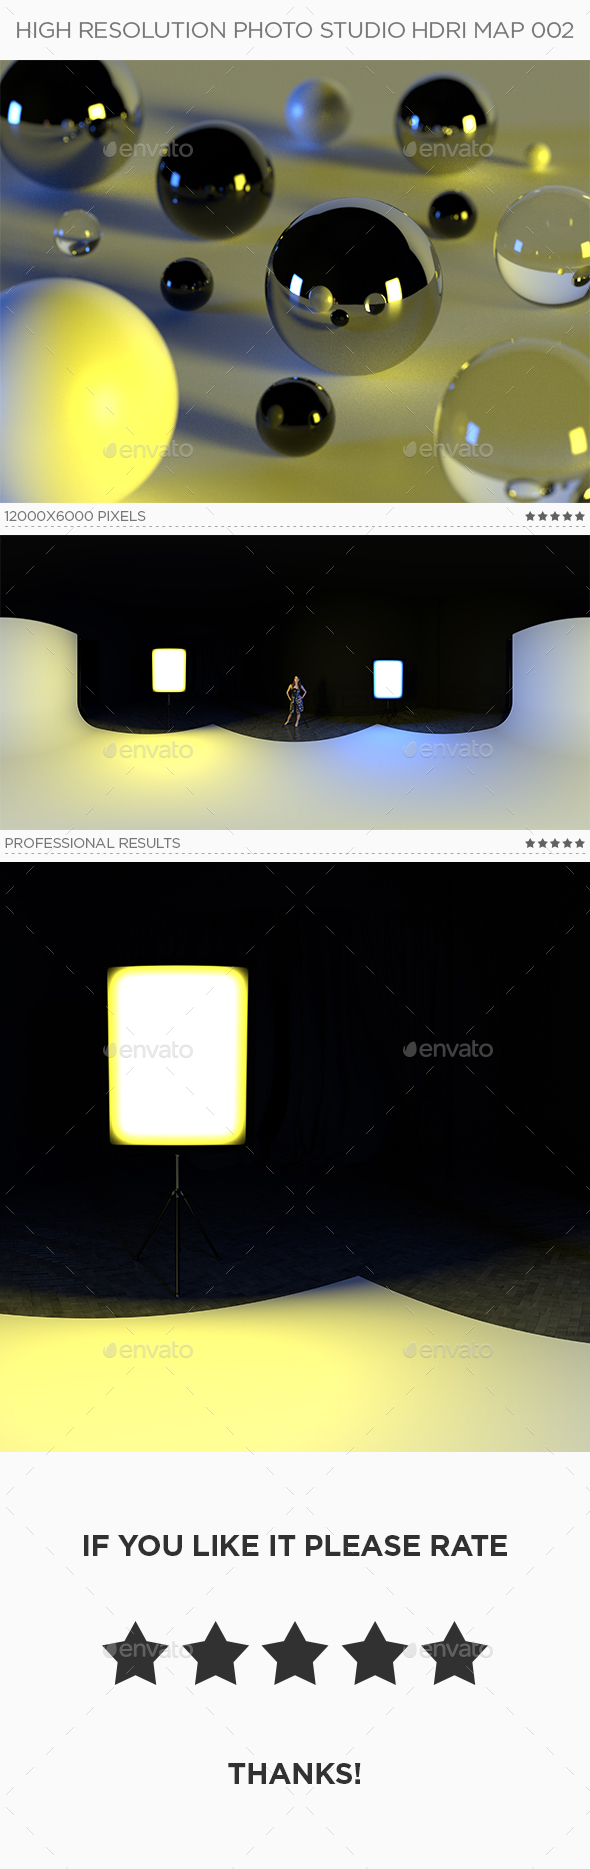 High Resolution Photo Studio HDRi Map 002 - 3DOcean Item for Sale